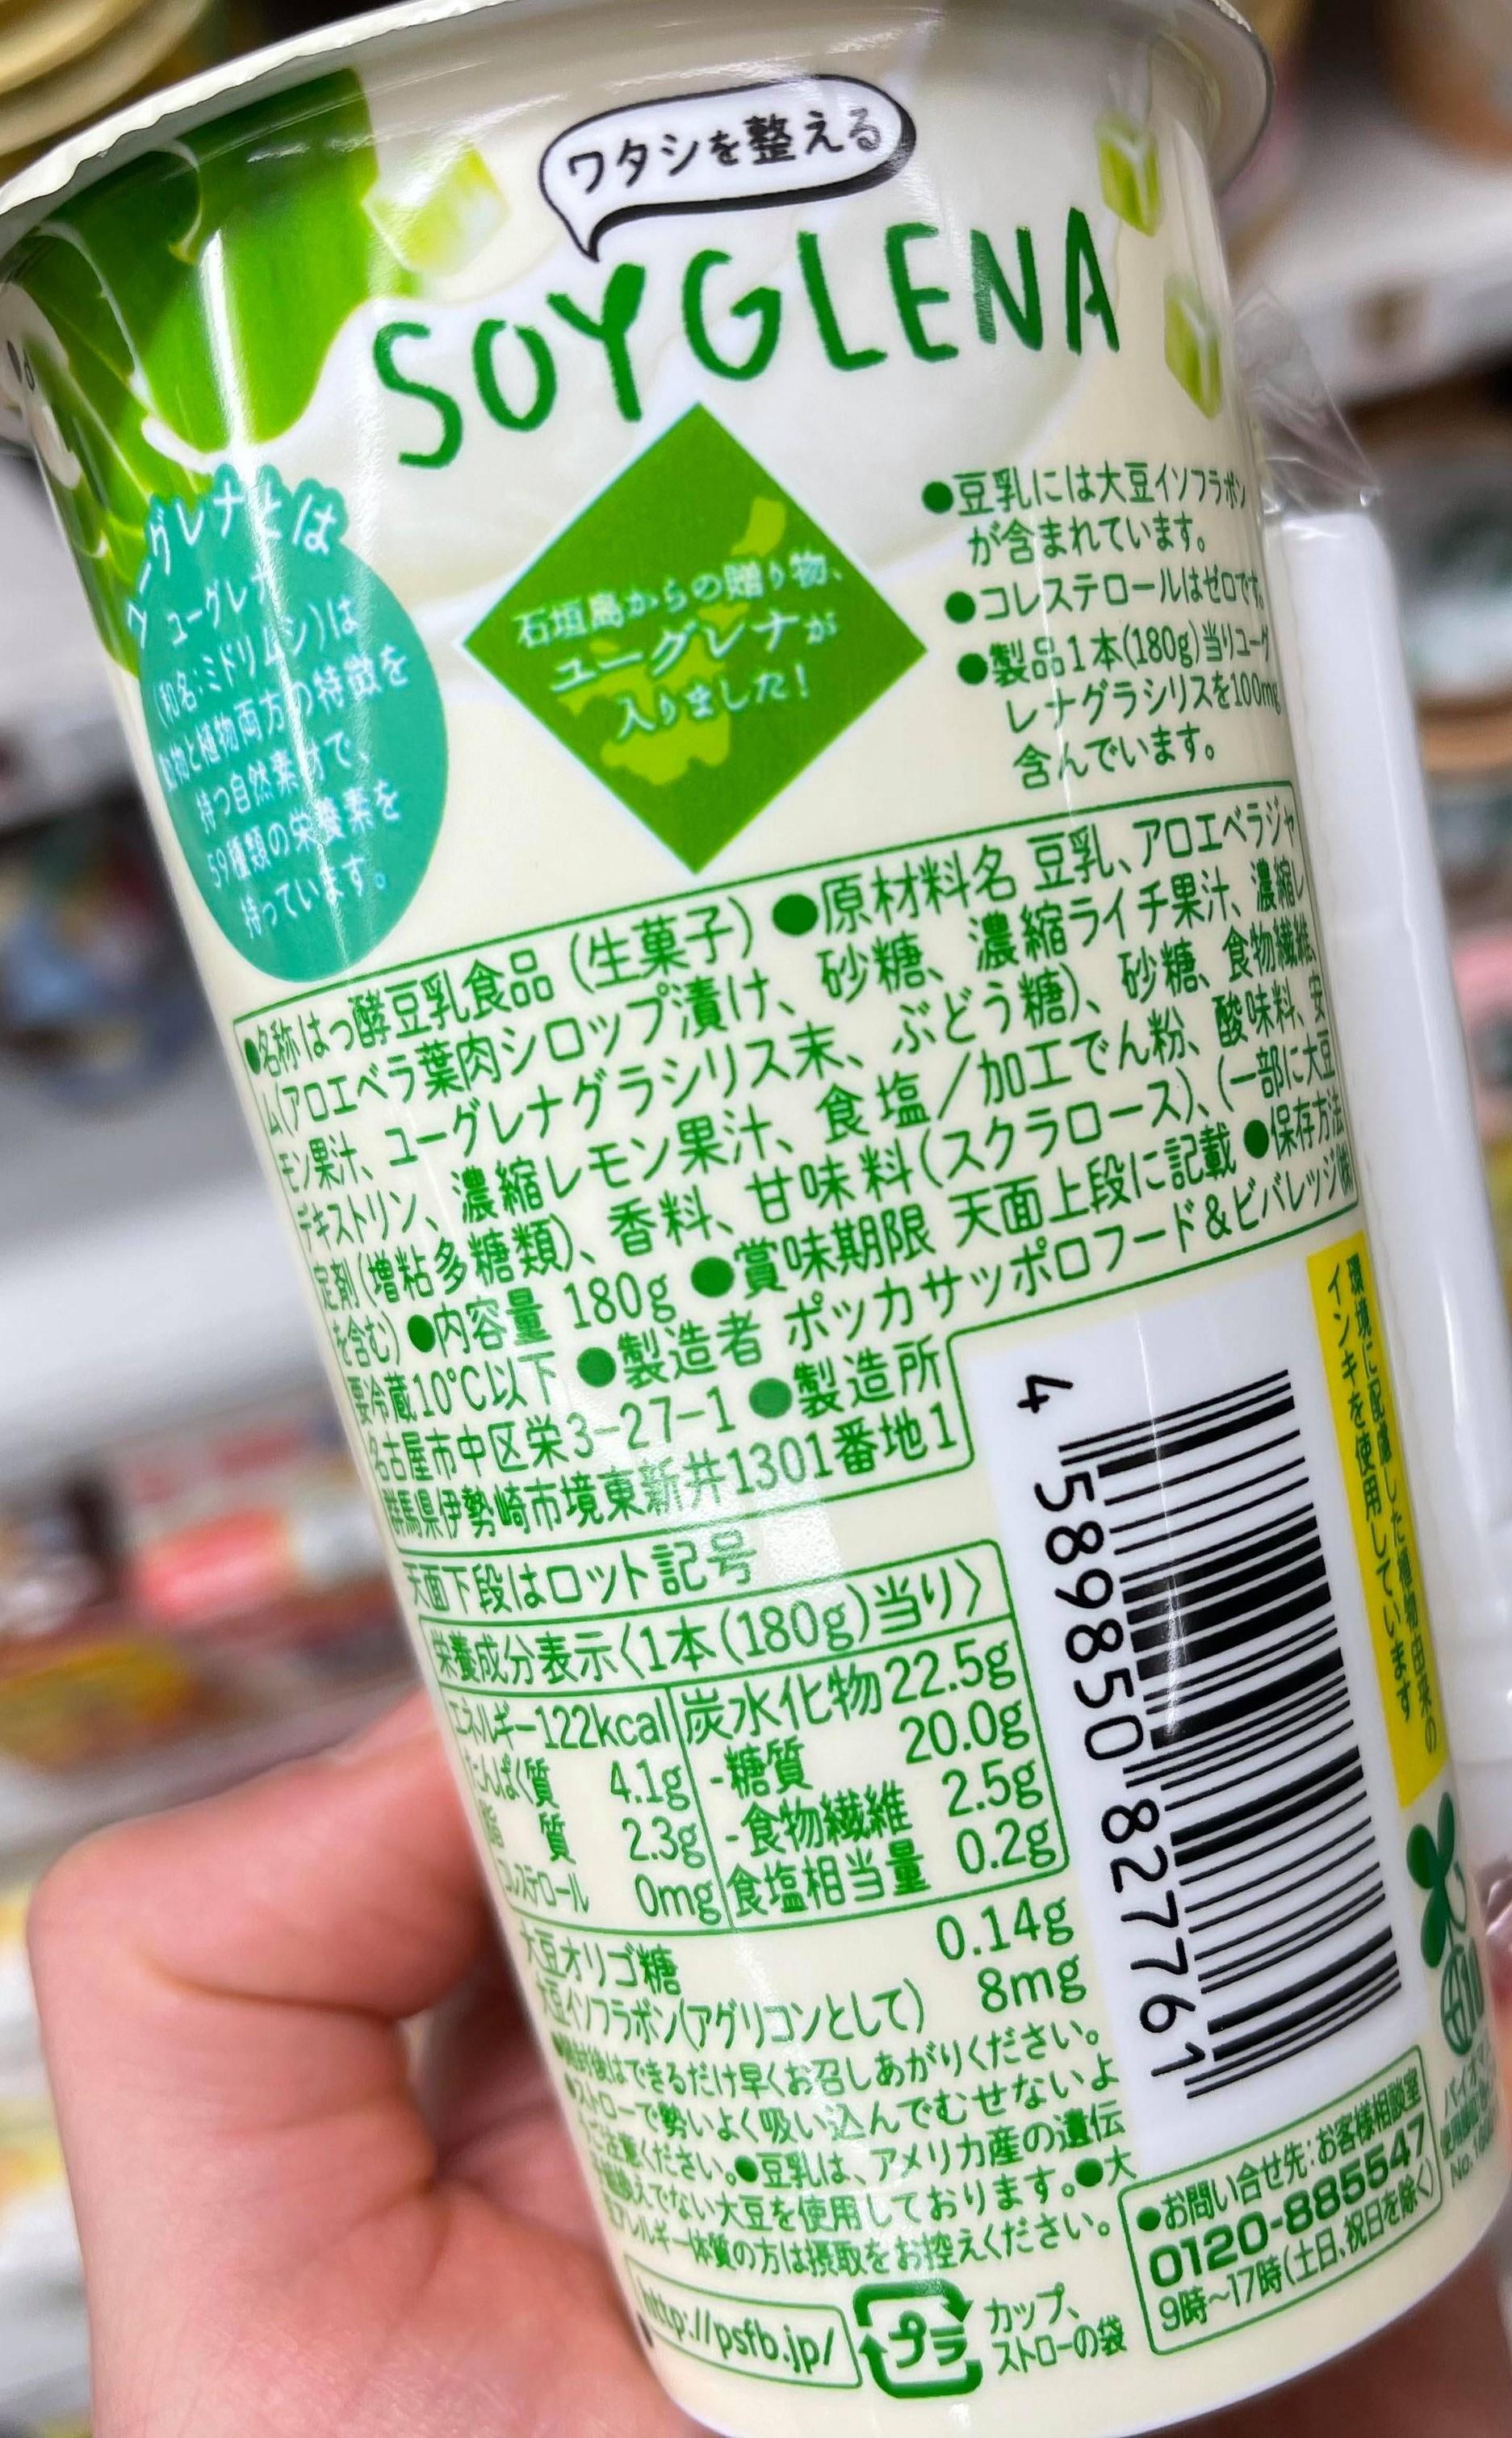 Pokka Sapporo Soyglena Soy Yogurt Drink, Aloe, back of package 3